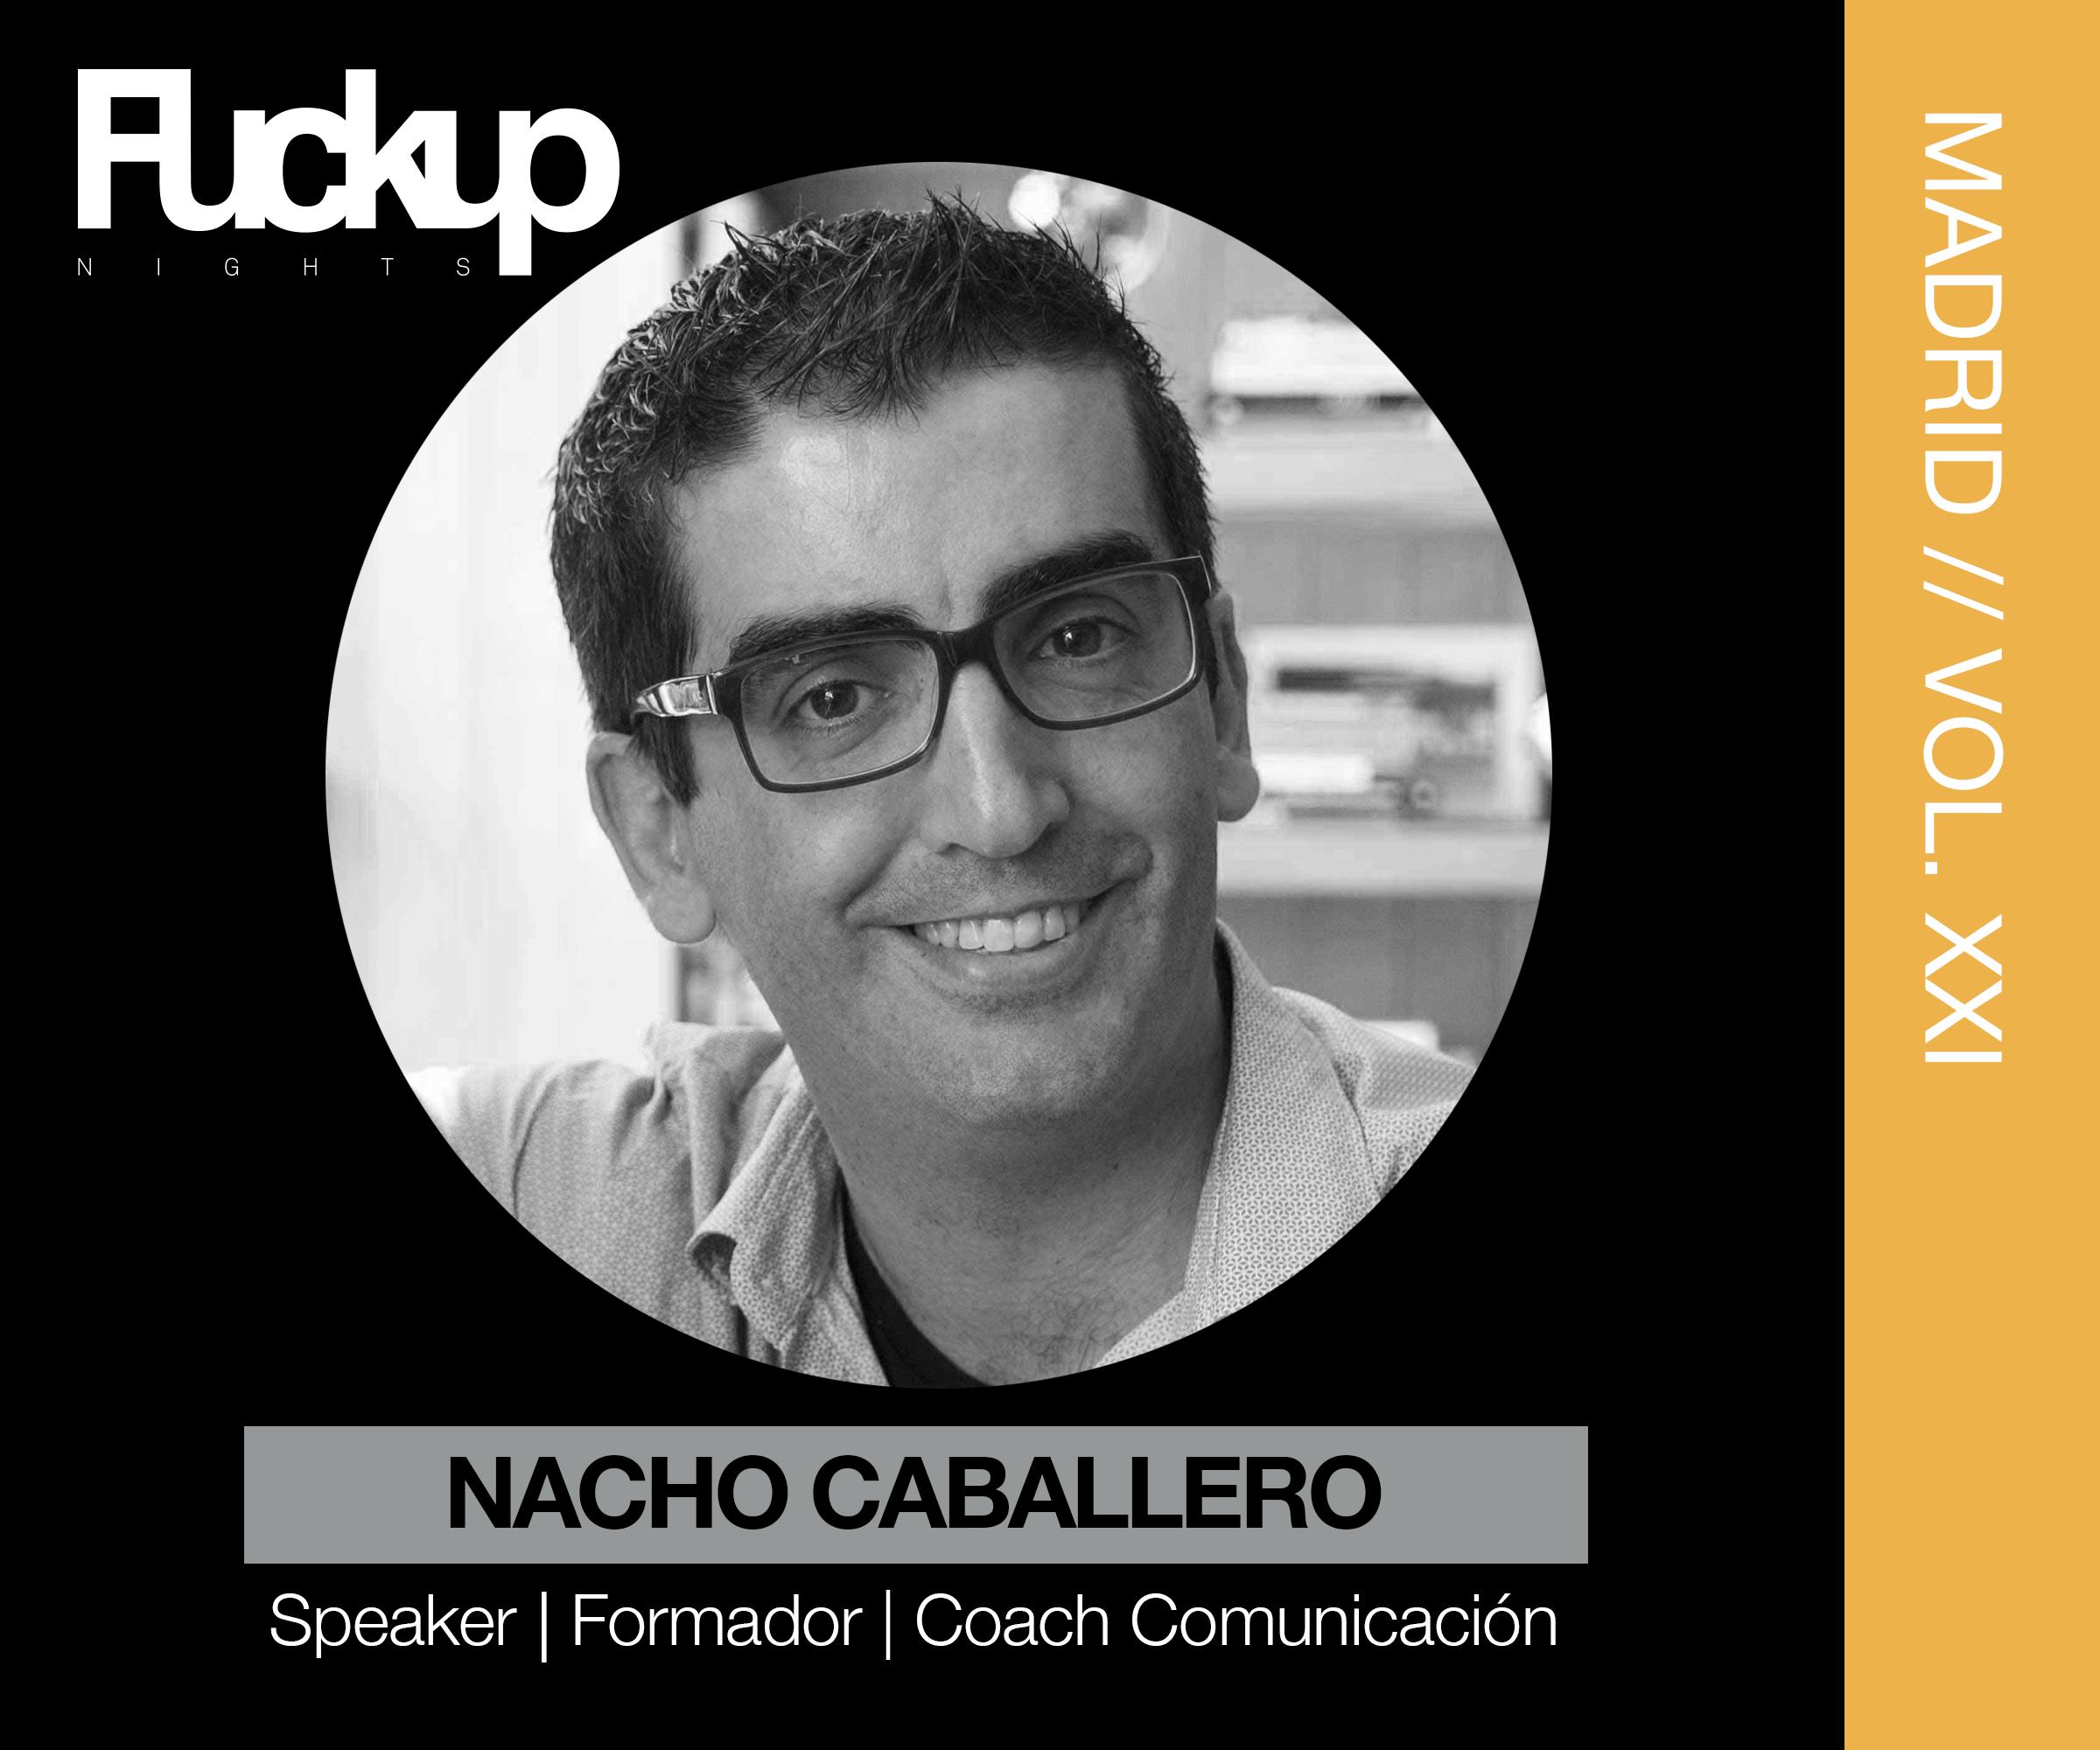 Nacho-Caballero-Fuckup